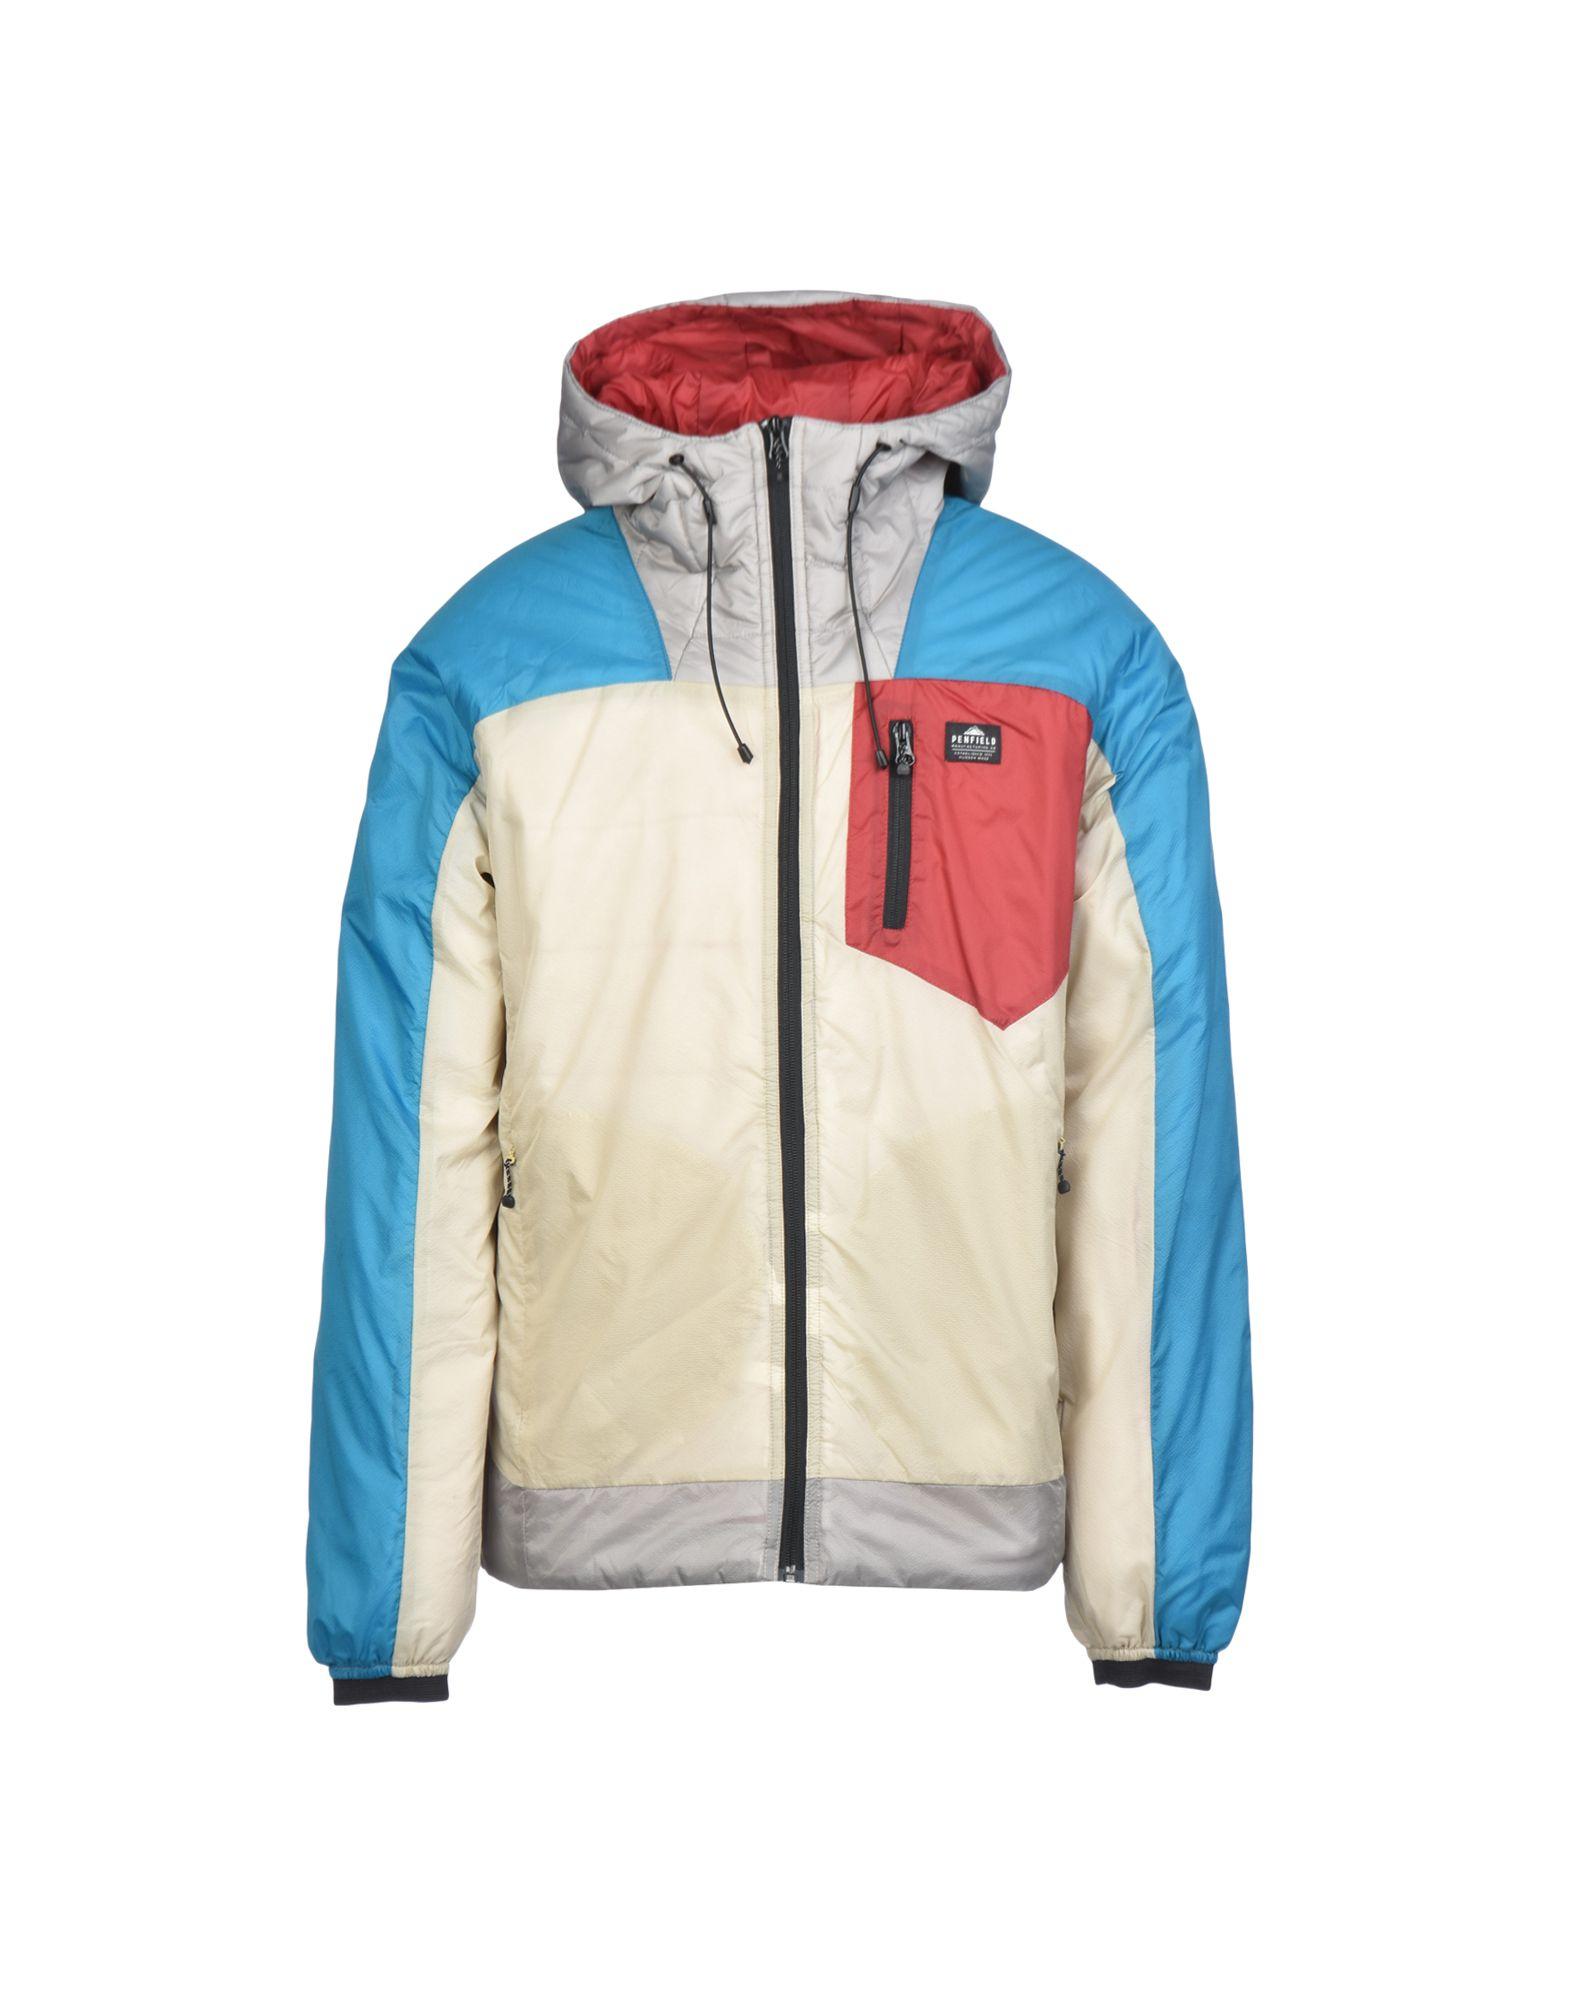 Giubbotto Penfield Mens Fordfields 4 Colour Blocked Jacket - Uomo - Acquista online su